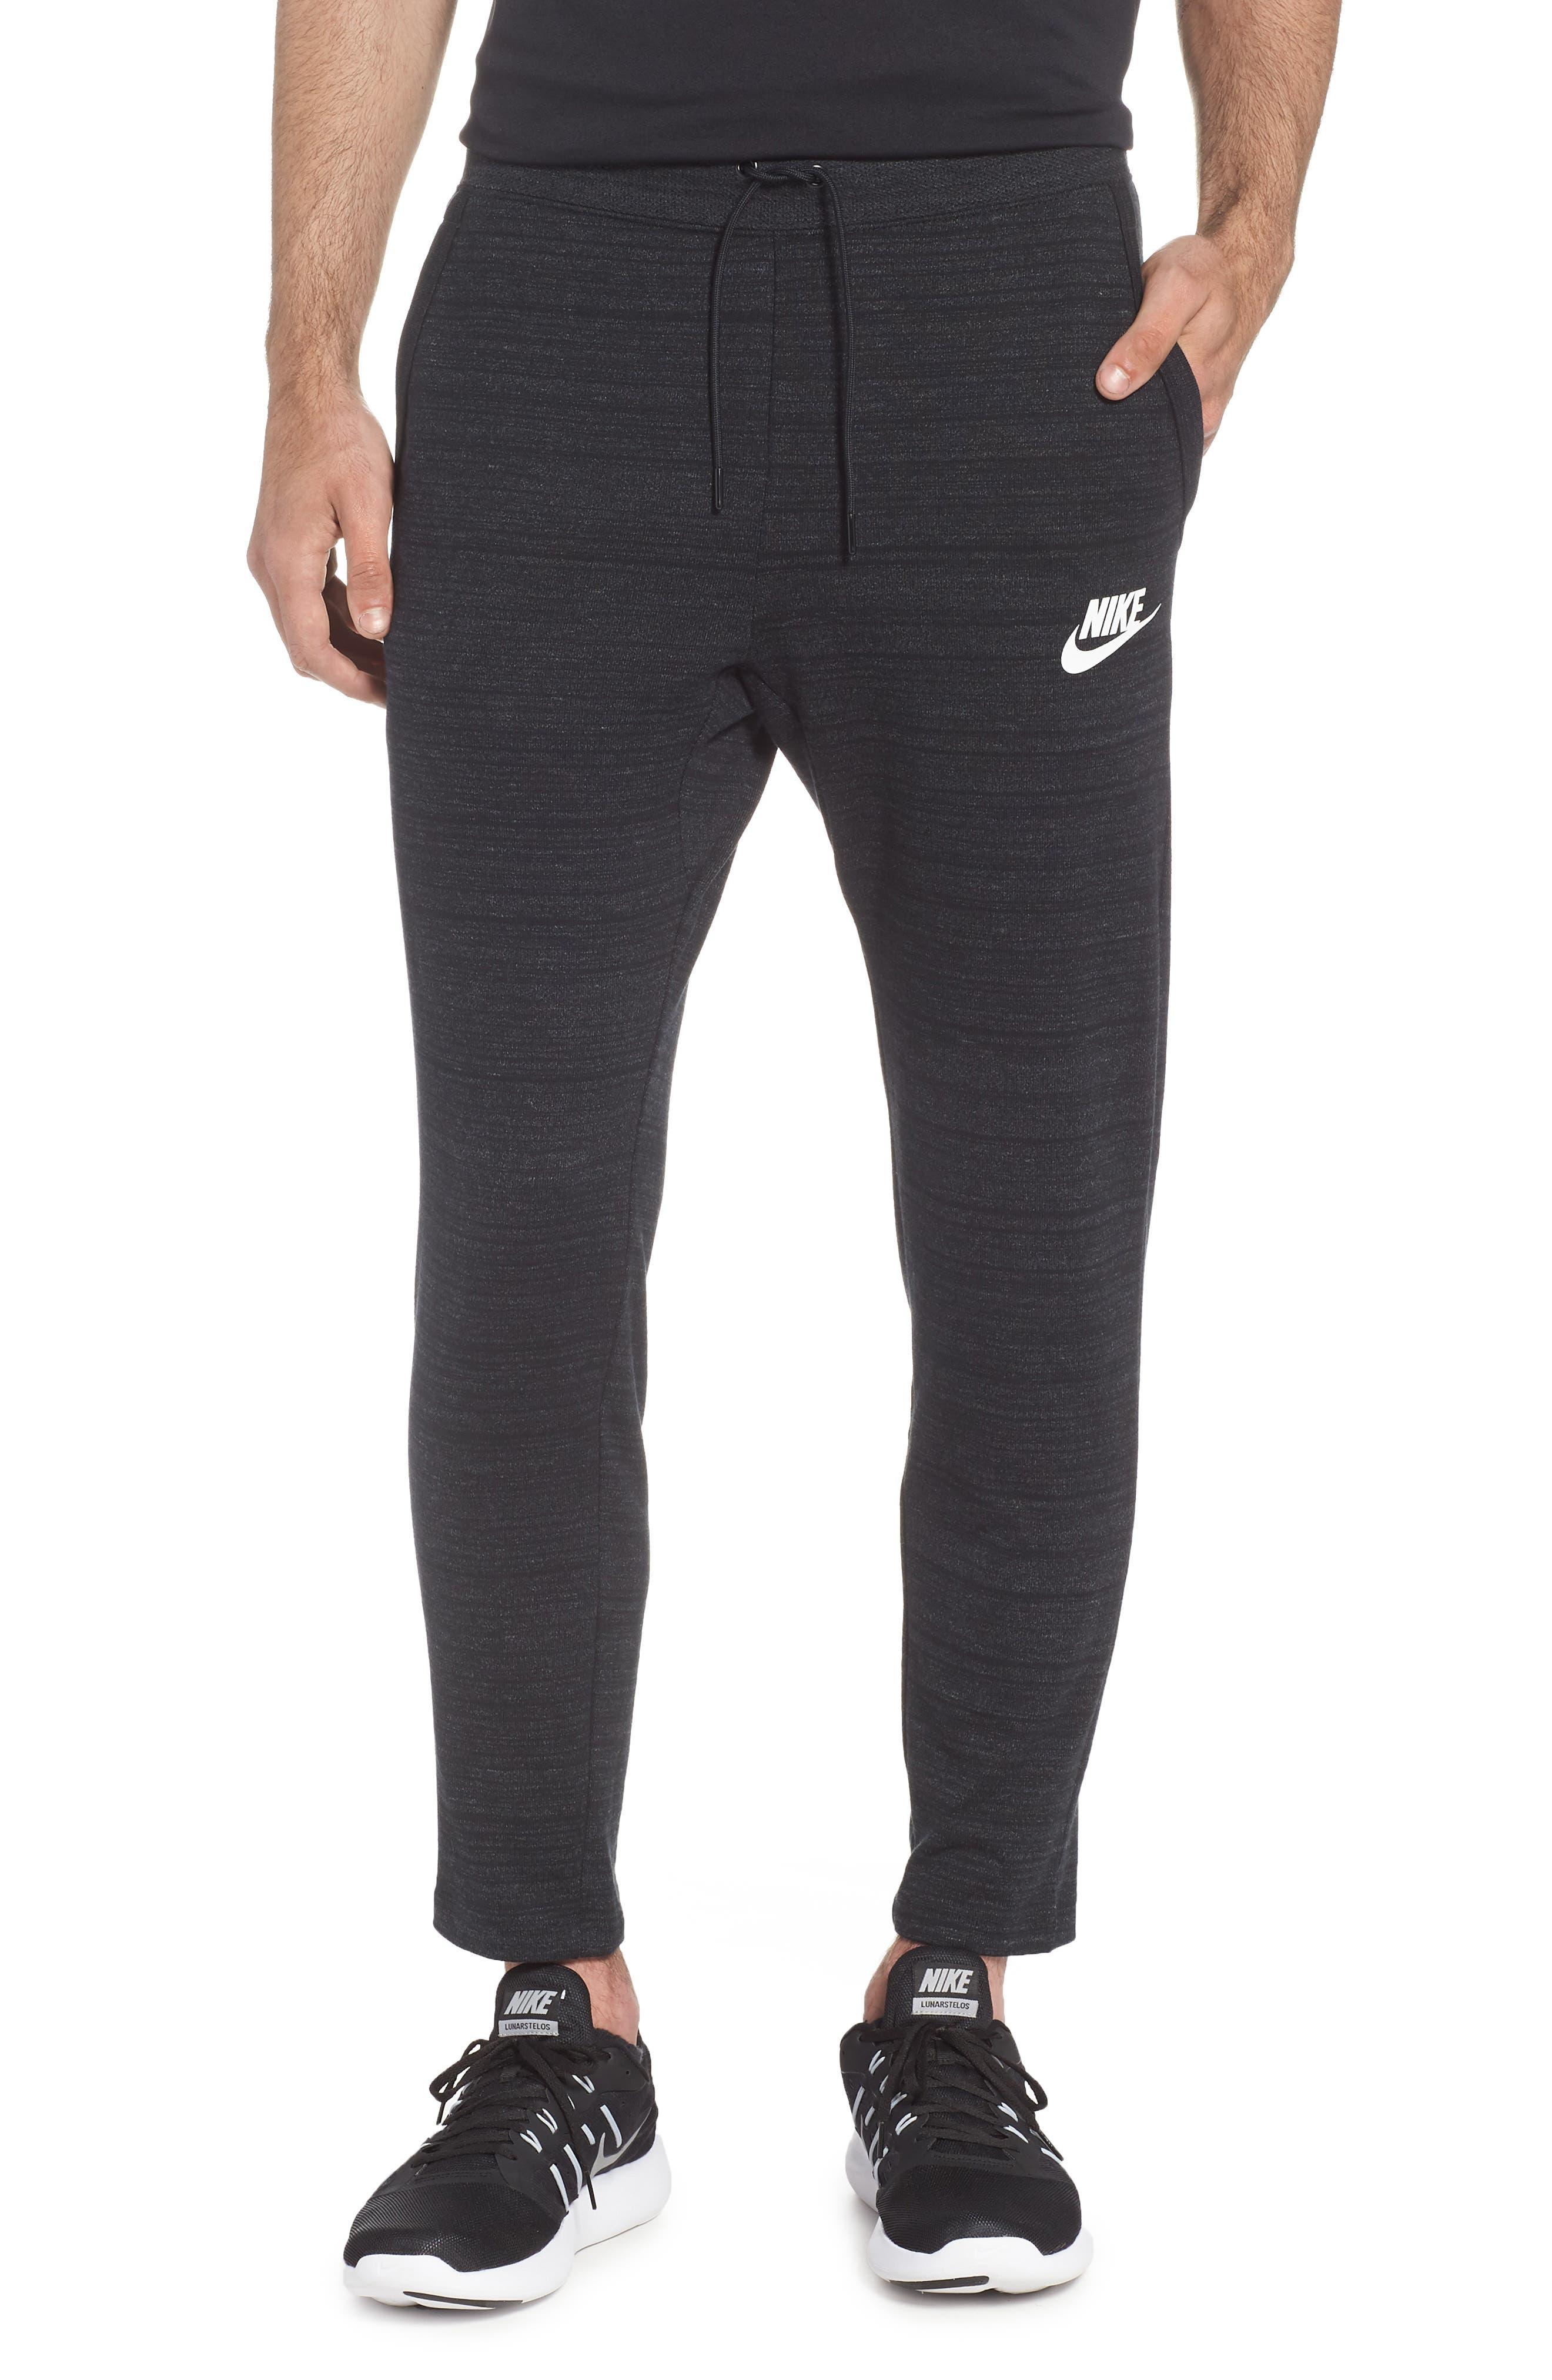 NSW Advance 15 Jogger Pants, Main, color, BLACK/ HEATHER/ WHITE